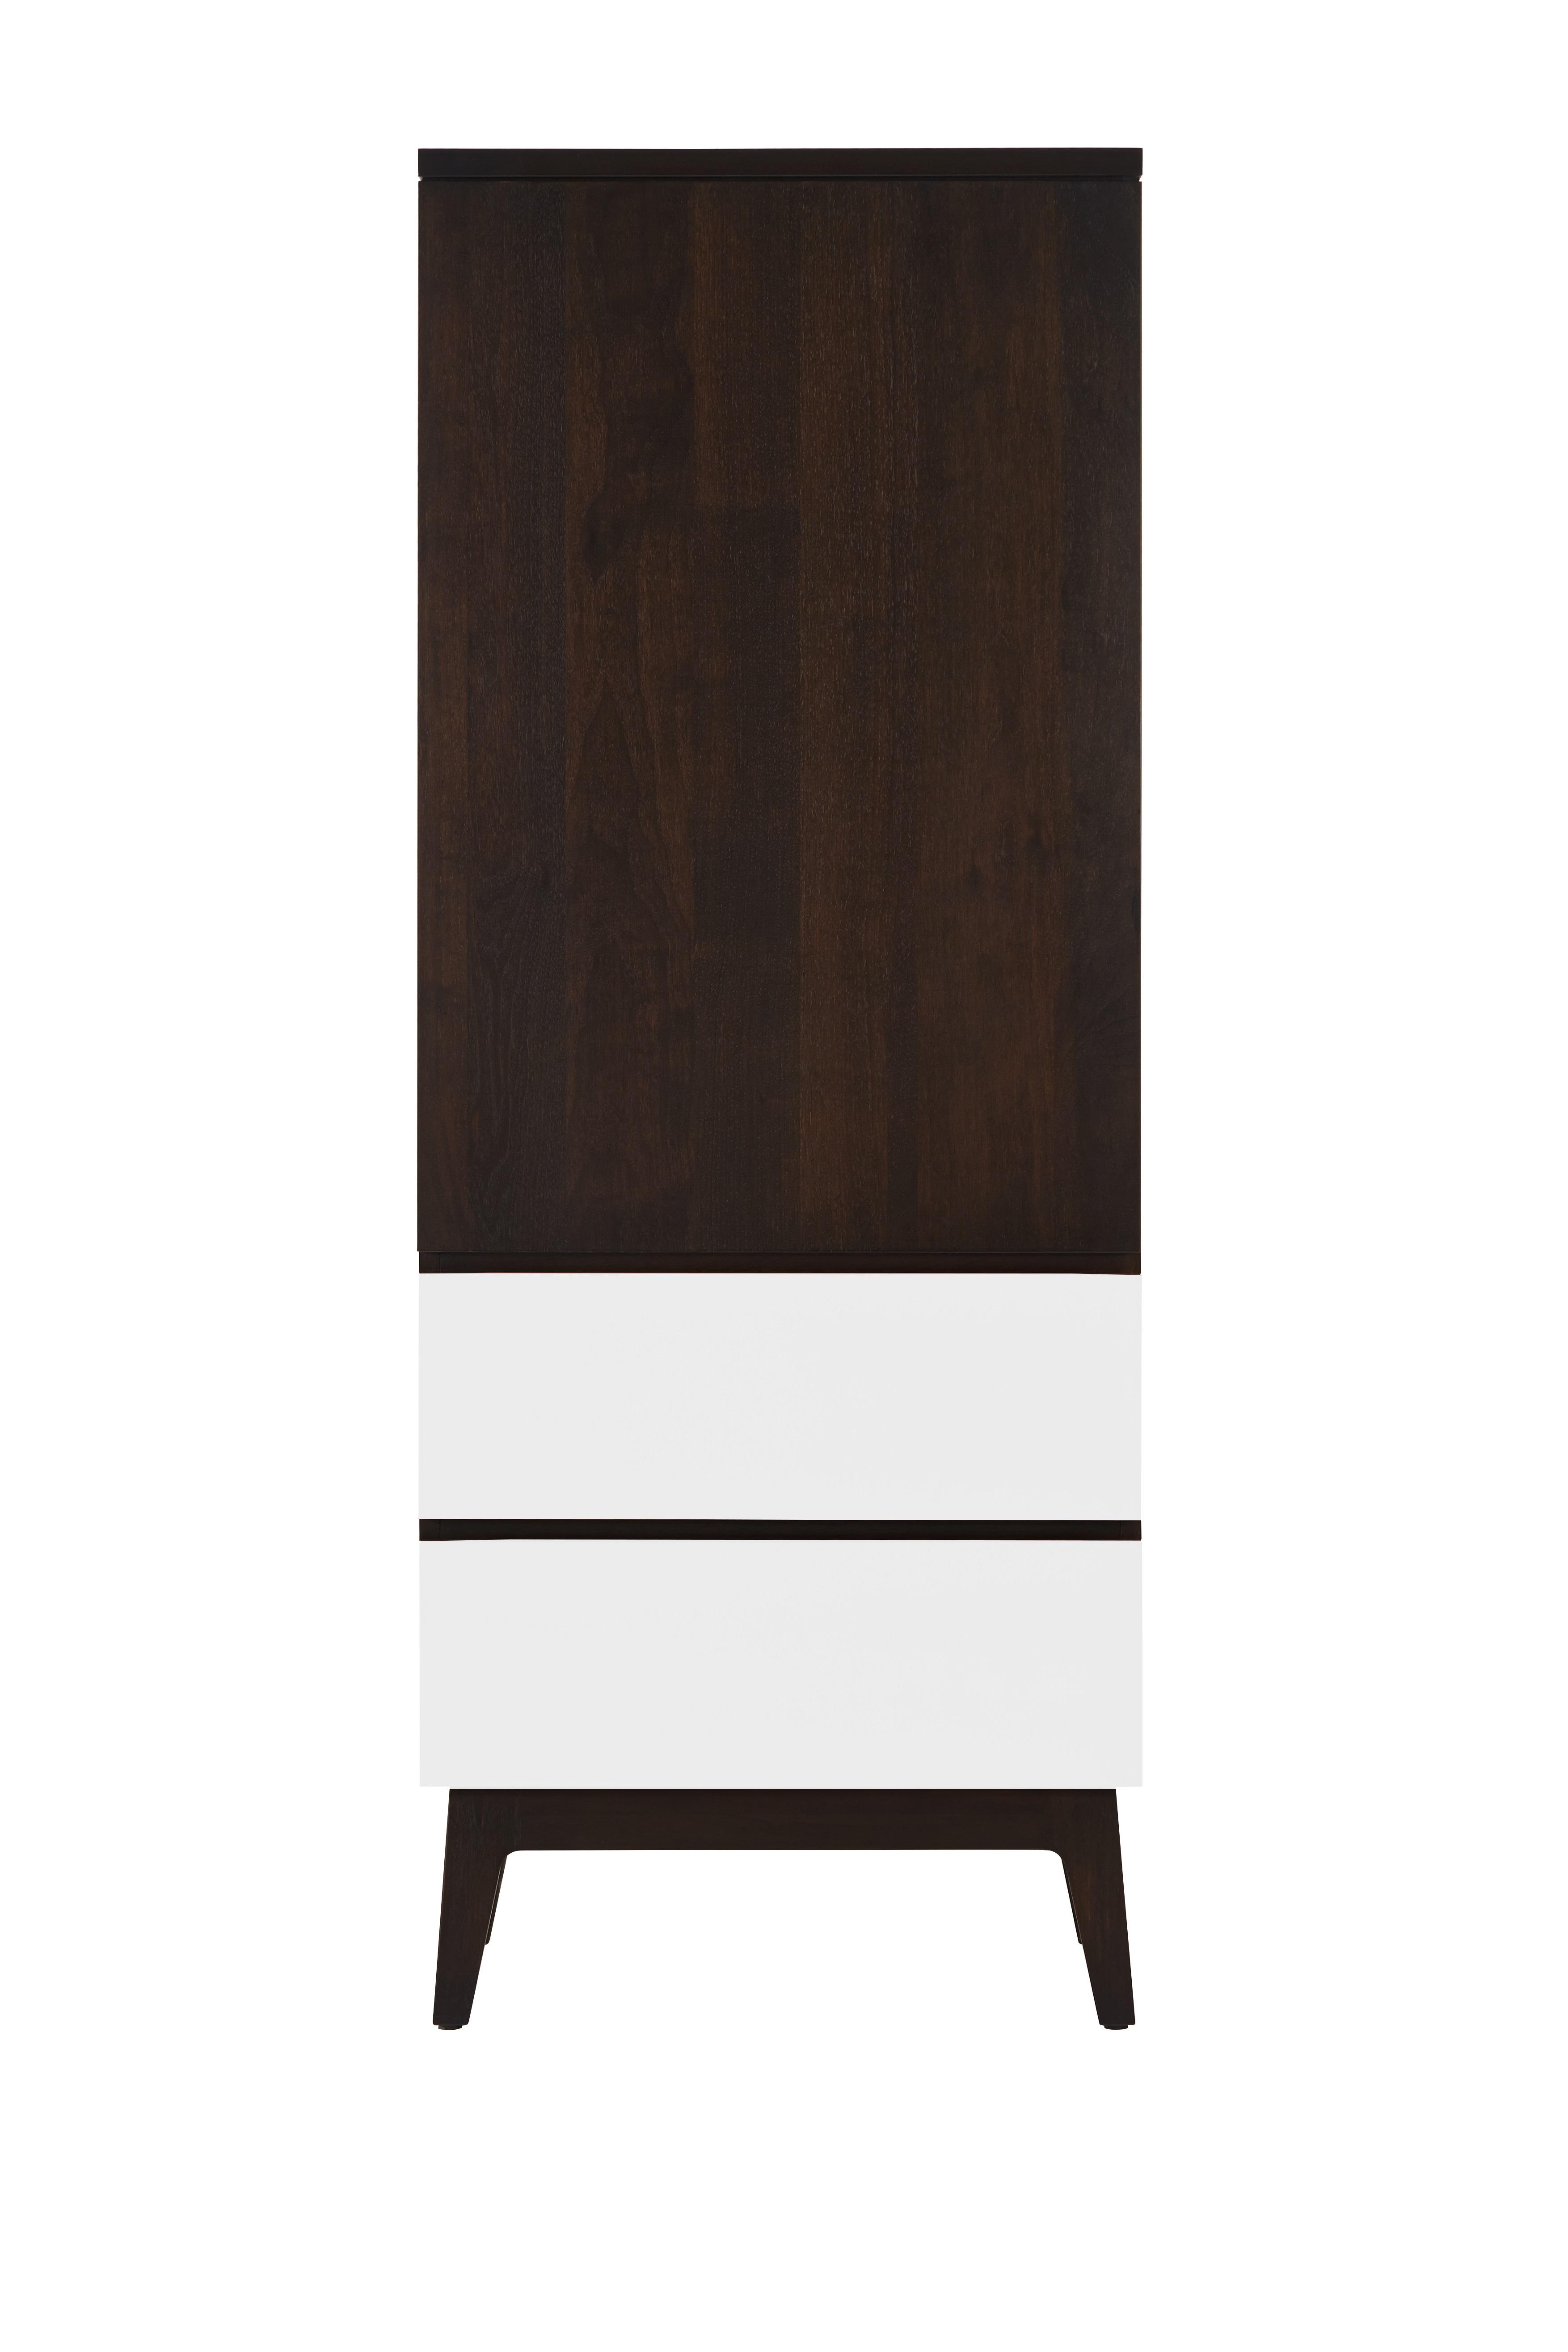 Serra-dressing-tower-coffee-with-MIST-5.jpg